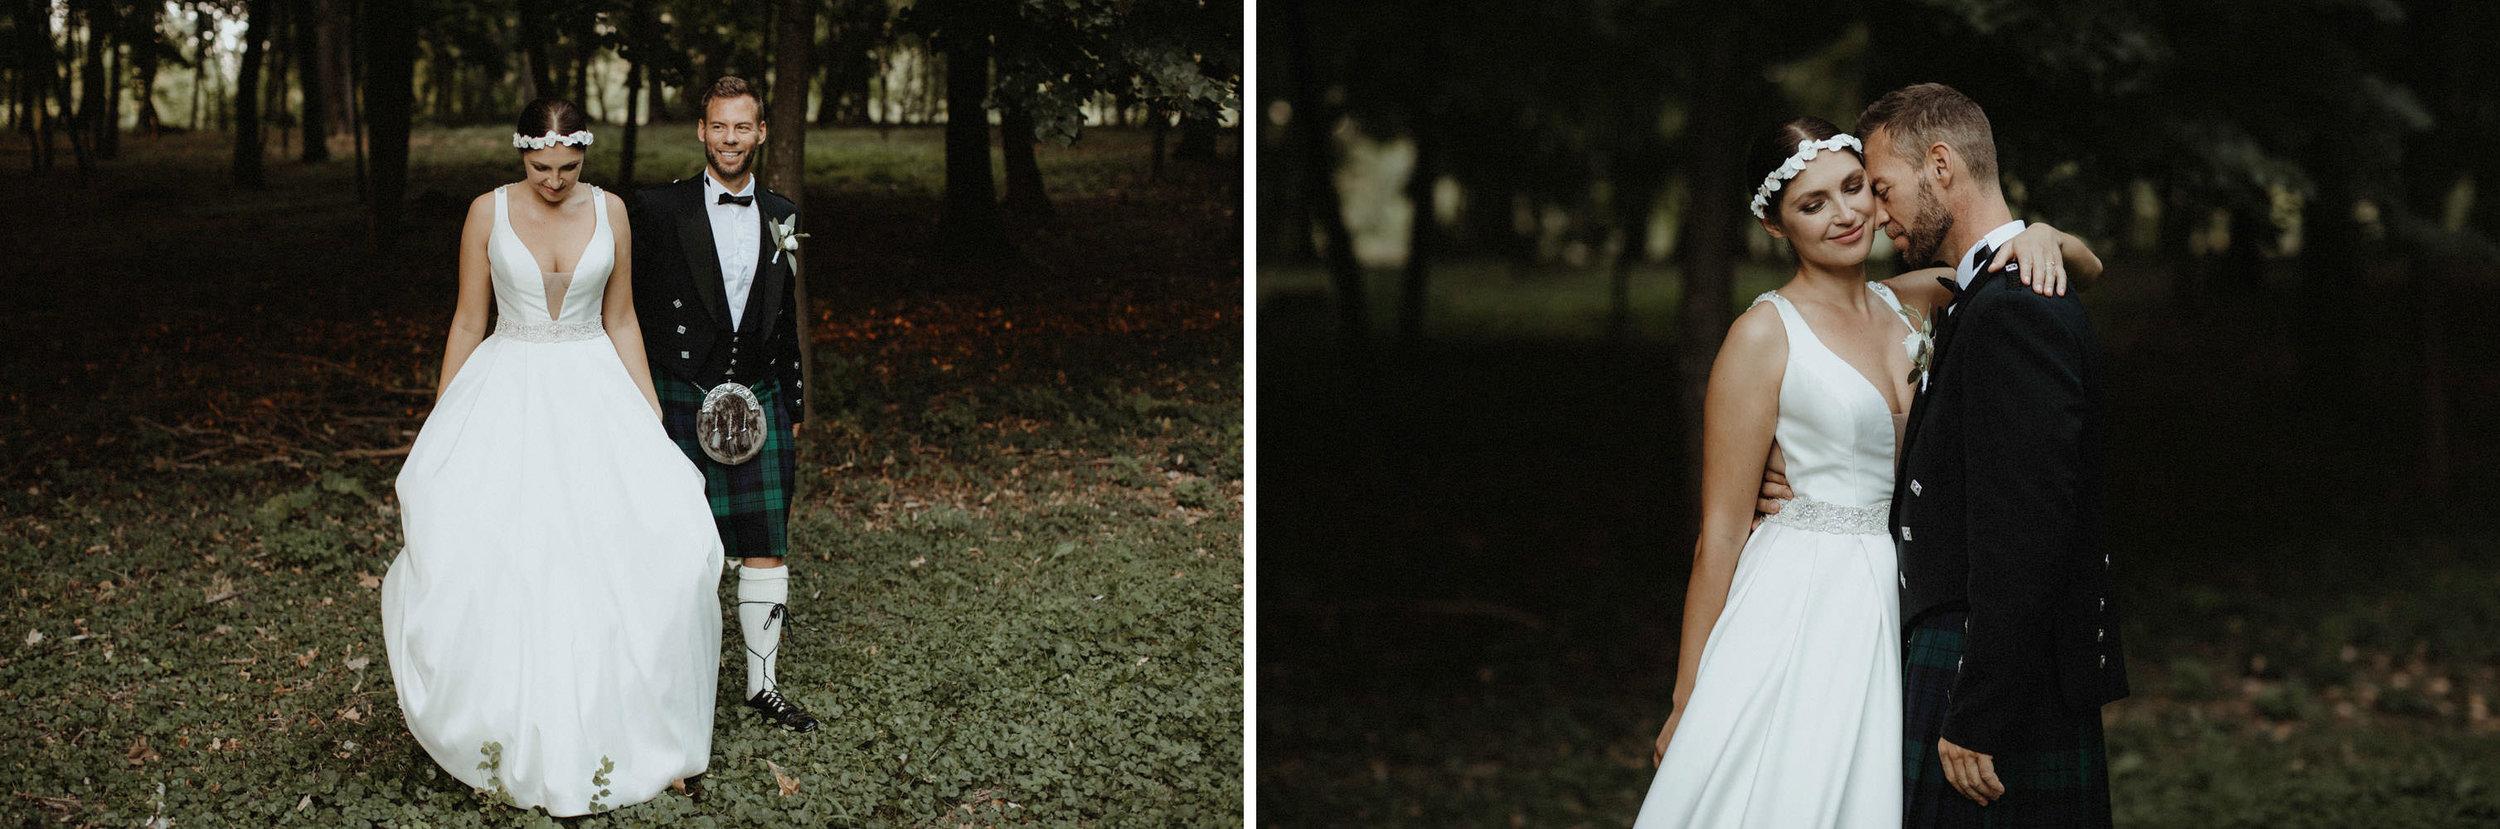 elopement-europe-photography_121(5055)2.jpg